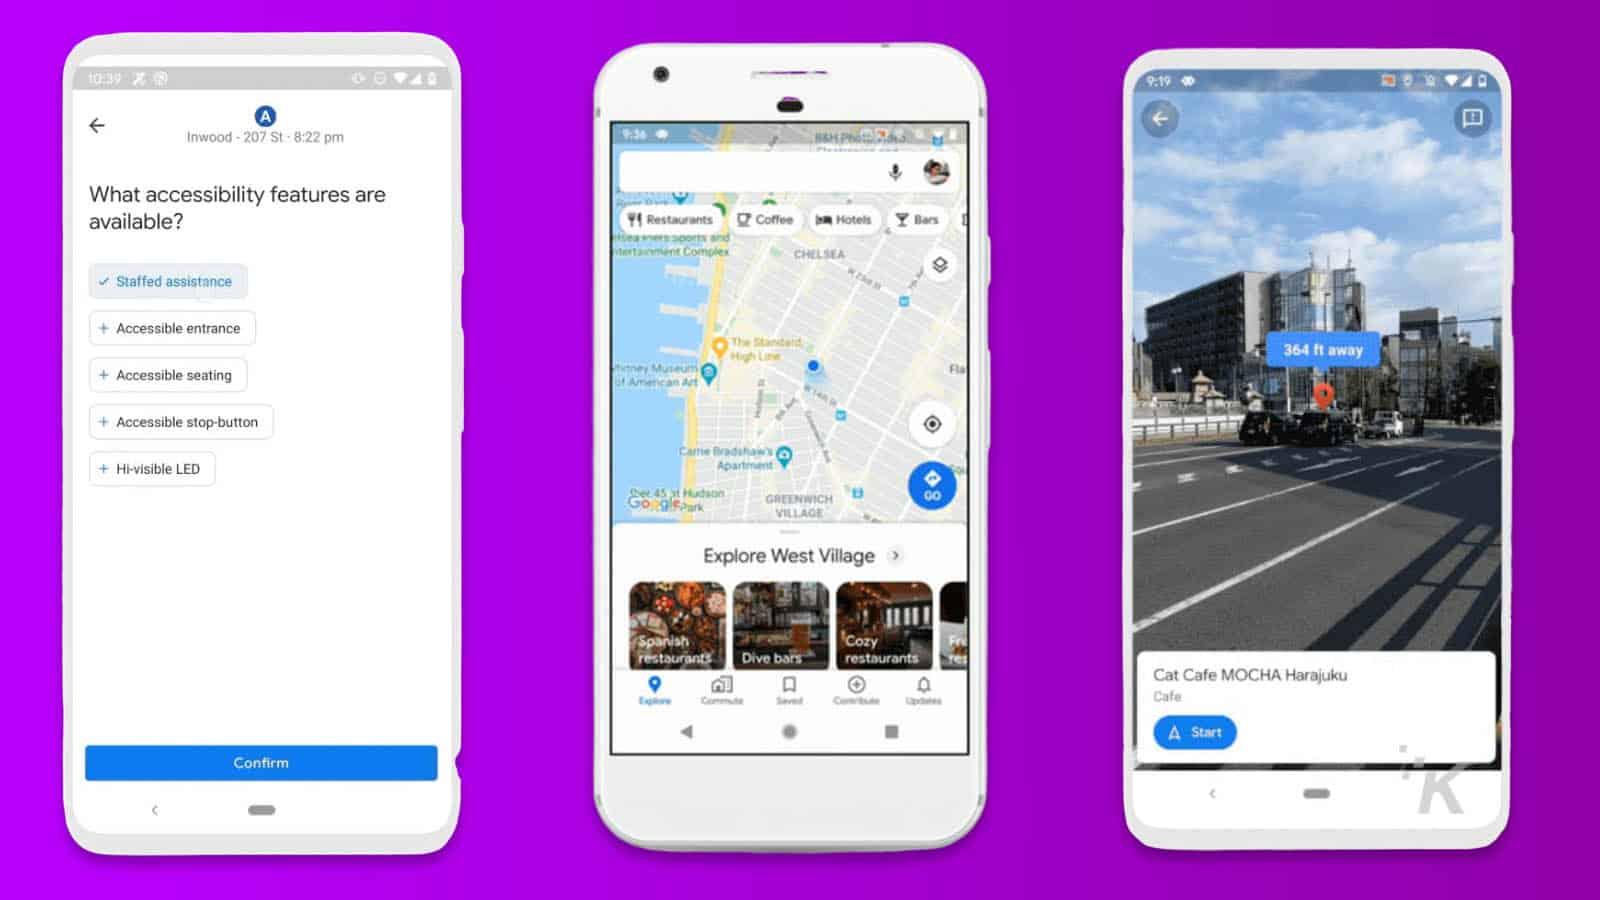 google maps update february 2020